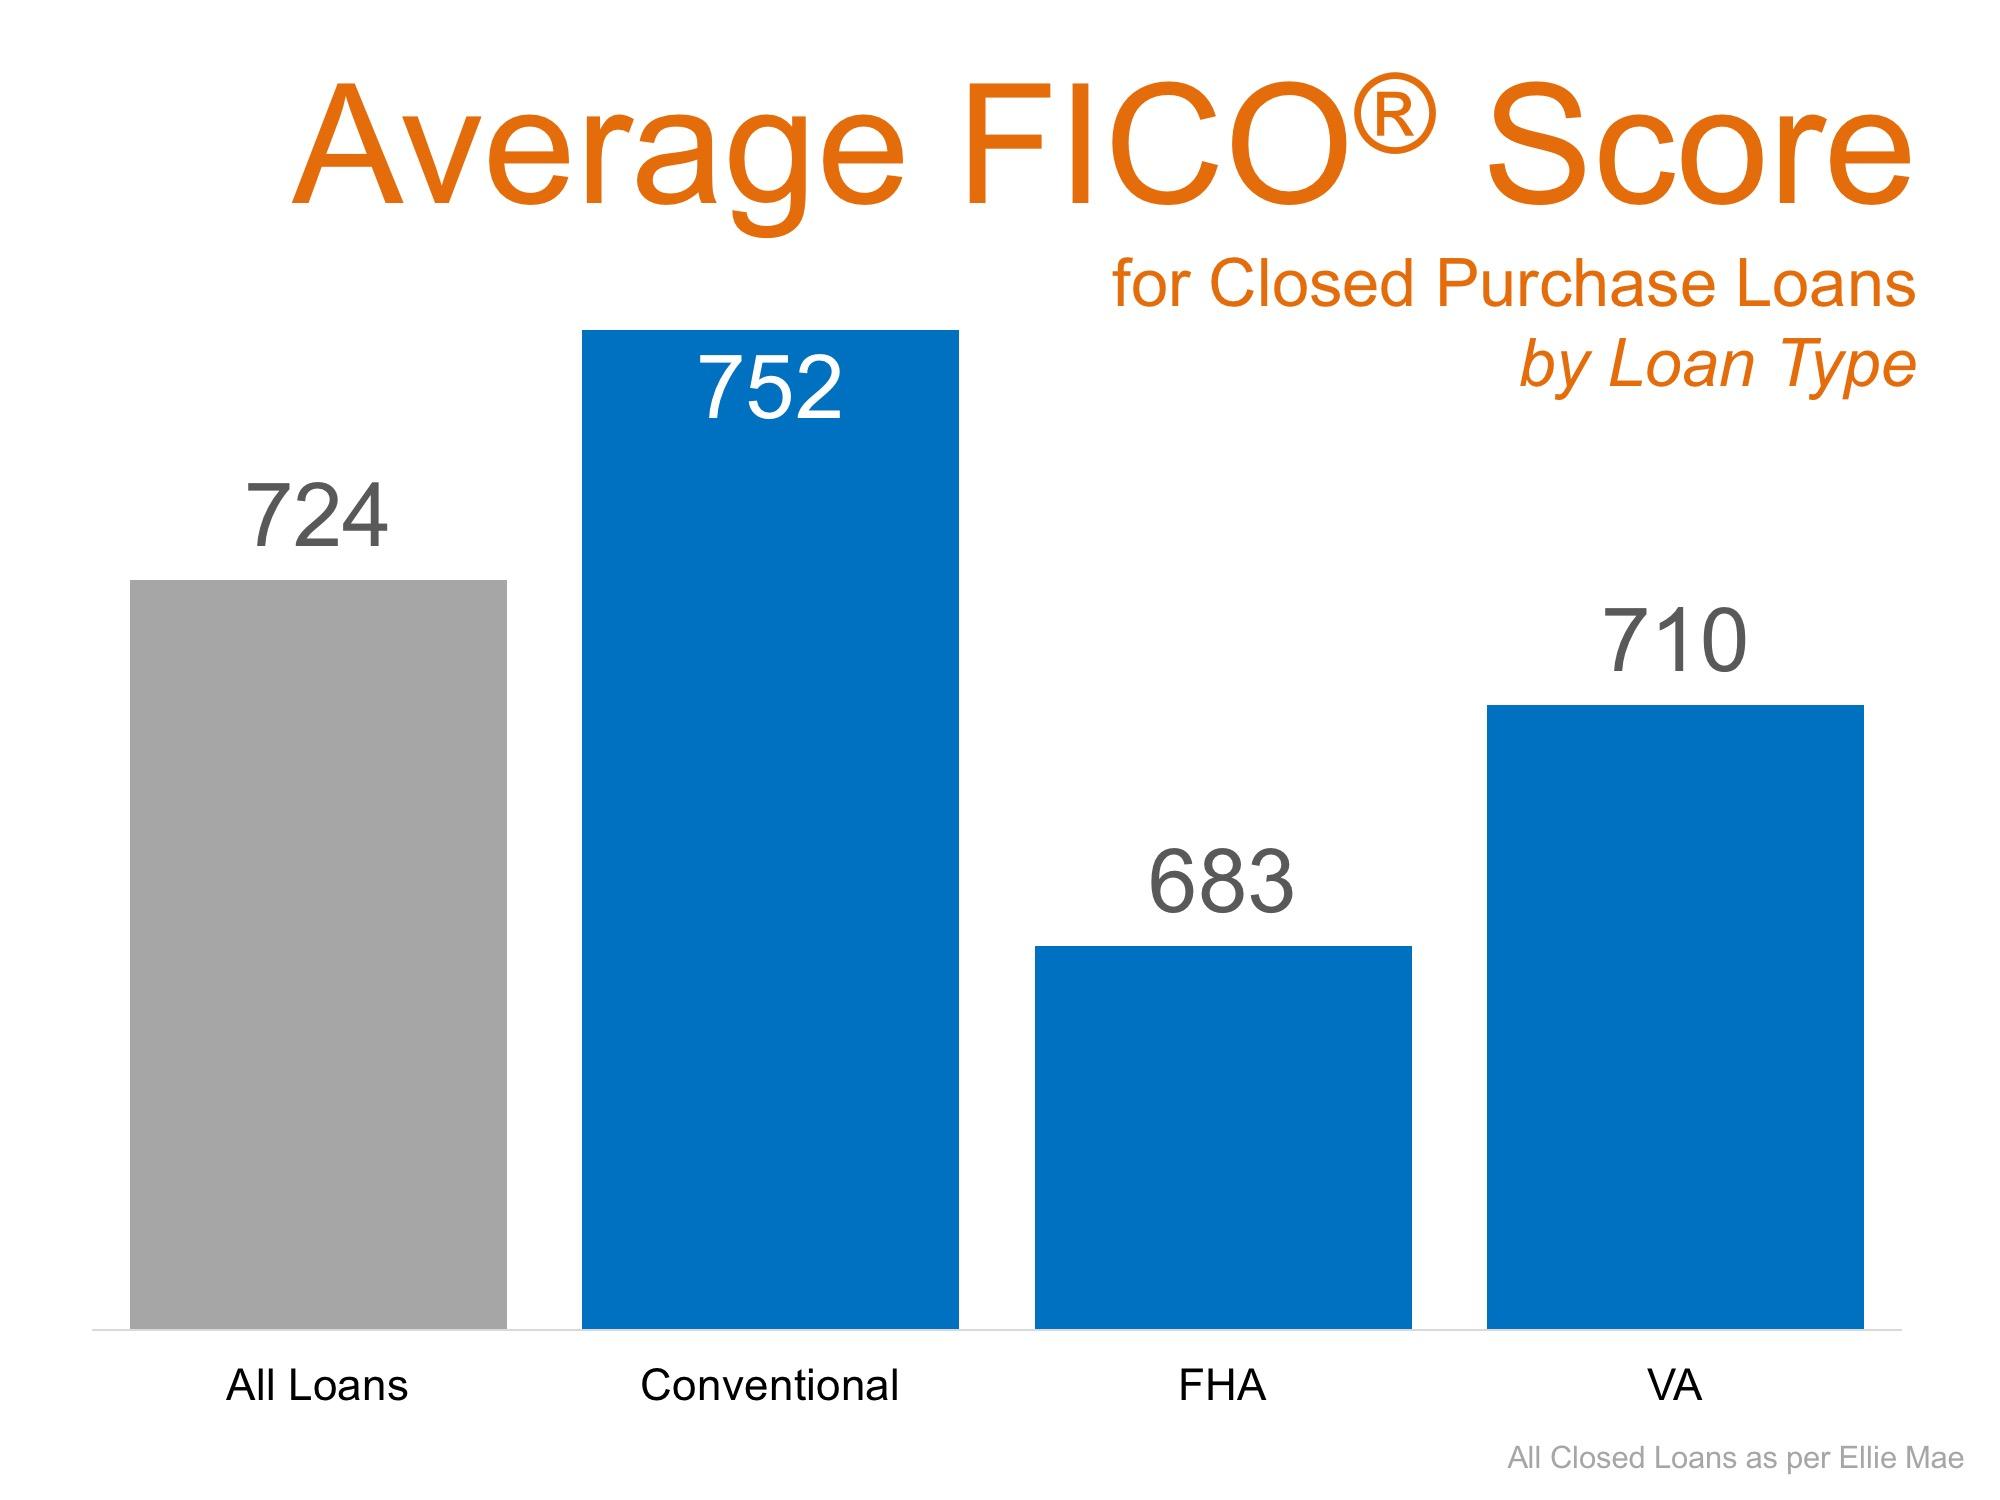 Average FICO Scores